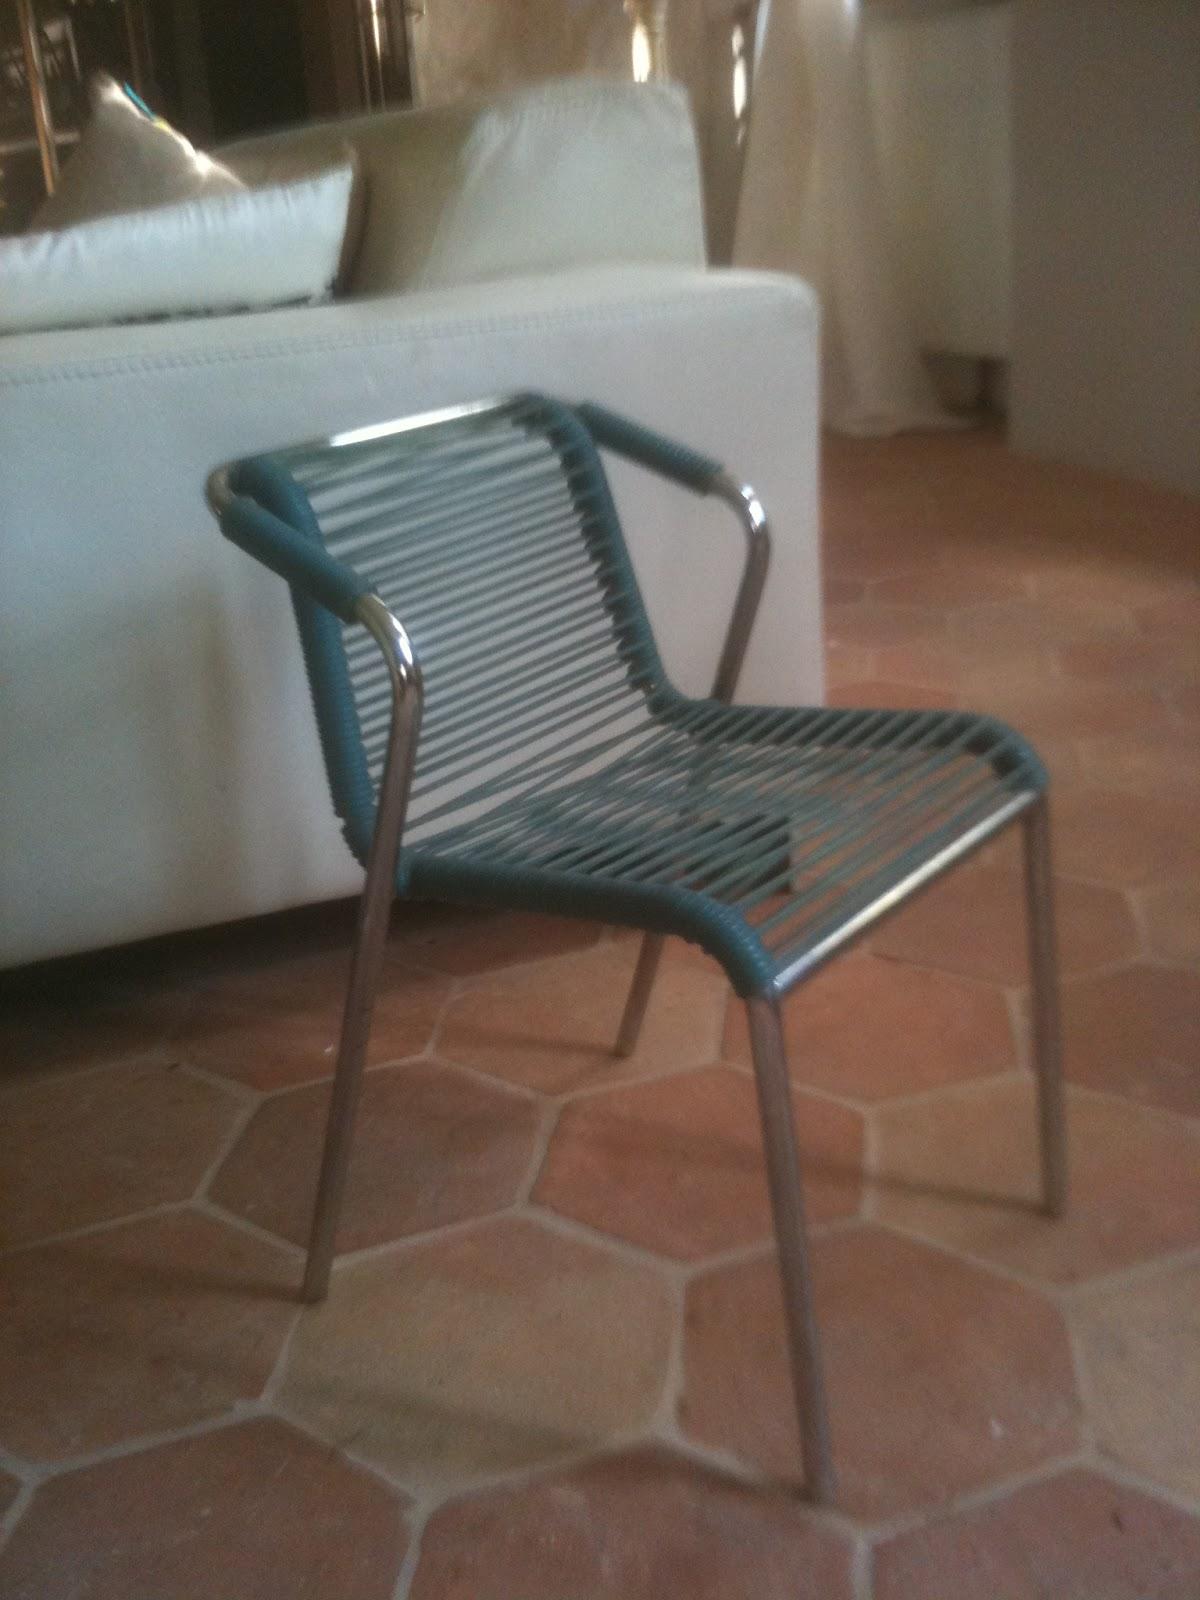 Mobilier scoubidou enfant - Chaise scoubidou vintage ...